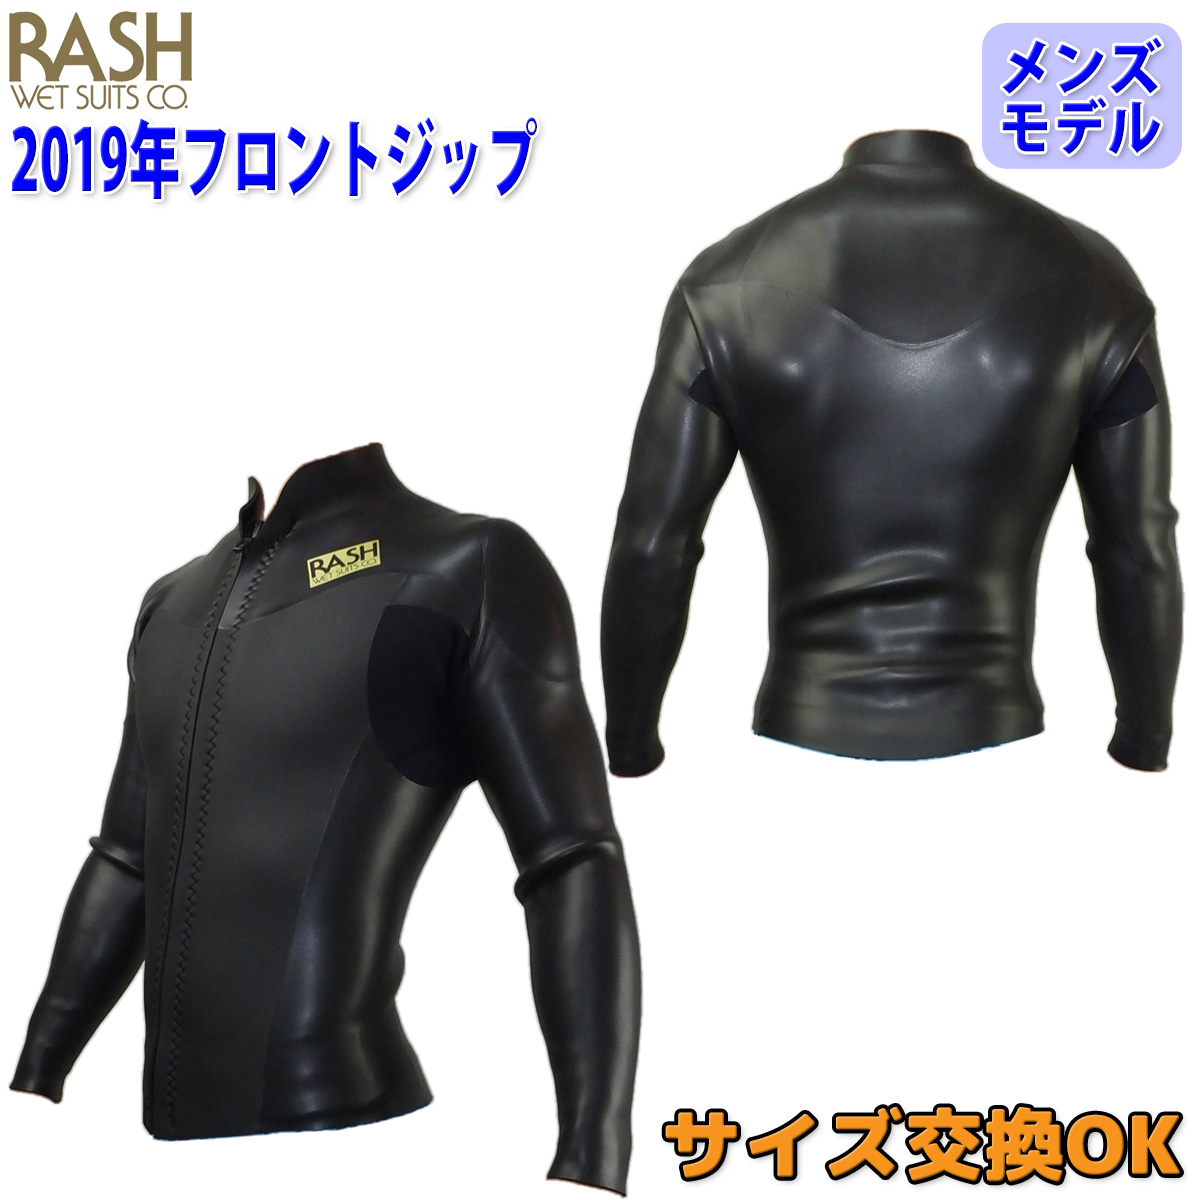 19 RASH ラッシュ 長袖タッパー ウェットスーツ ウエットスーツ フロントジッパー バリュー 春夏用 メンズモデル 2019年 日本正規品